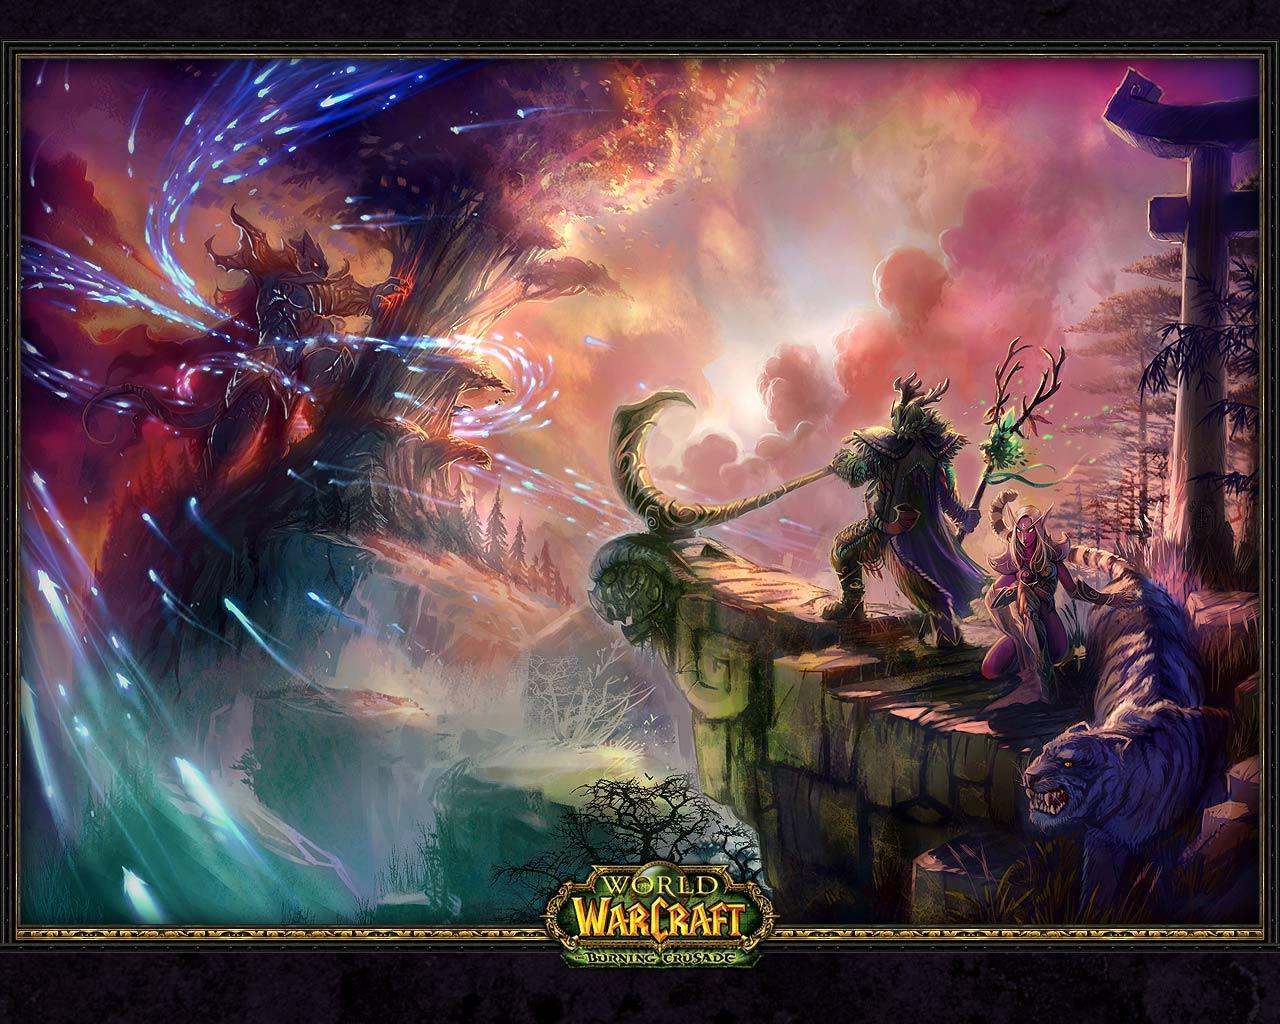 Warcraft Wallpapers - Wallpaper Cave